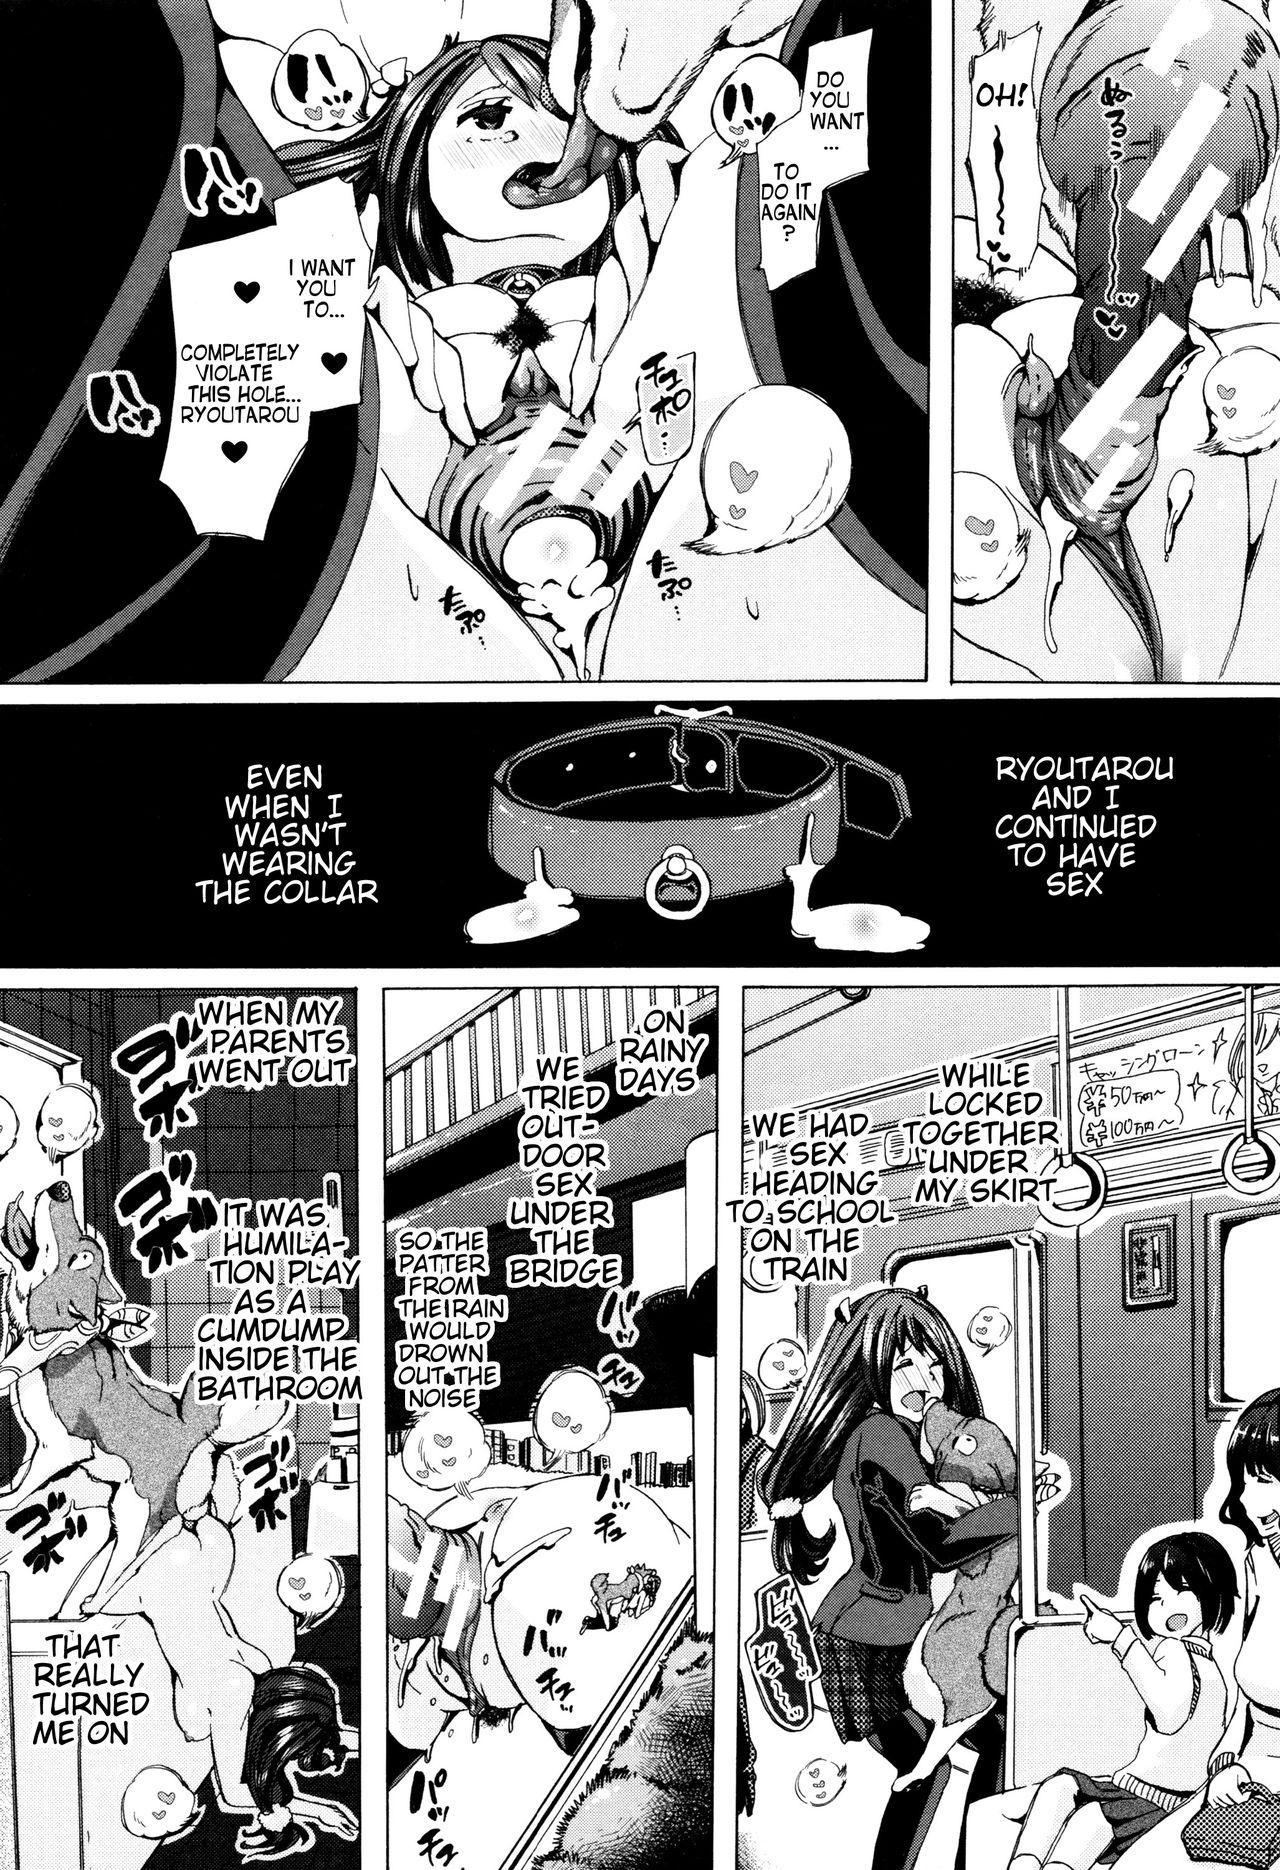 [Chikiko] Juukan Kyoushitsu - Bestiality Classroom Ch. 1-5 [English] [Neeko7] 135